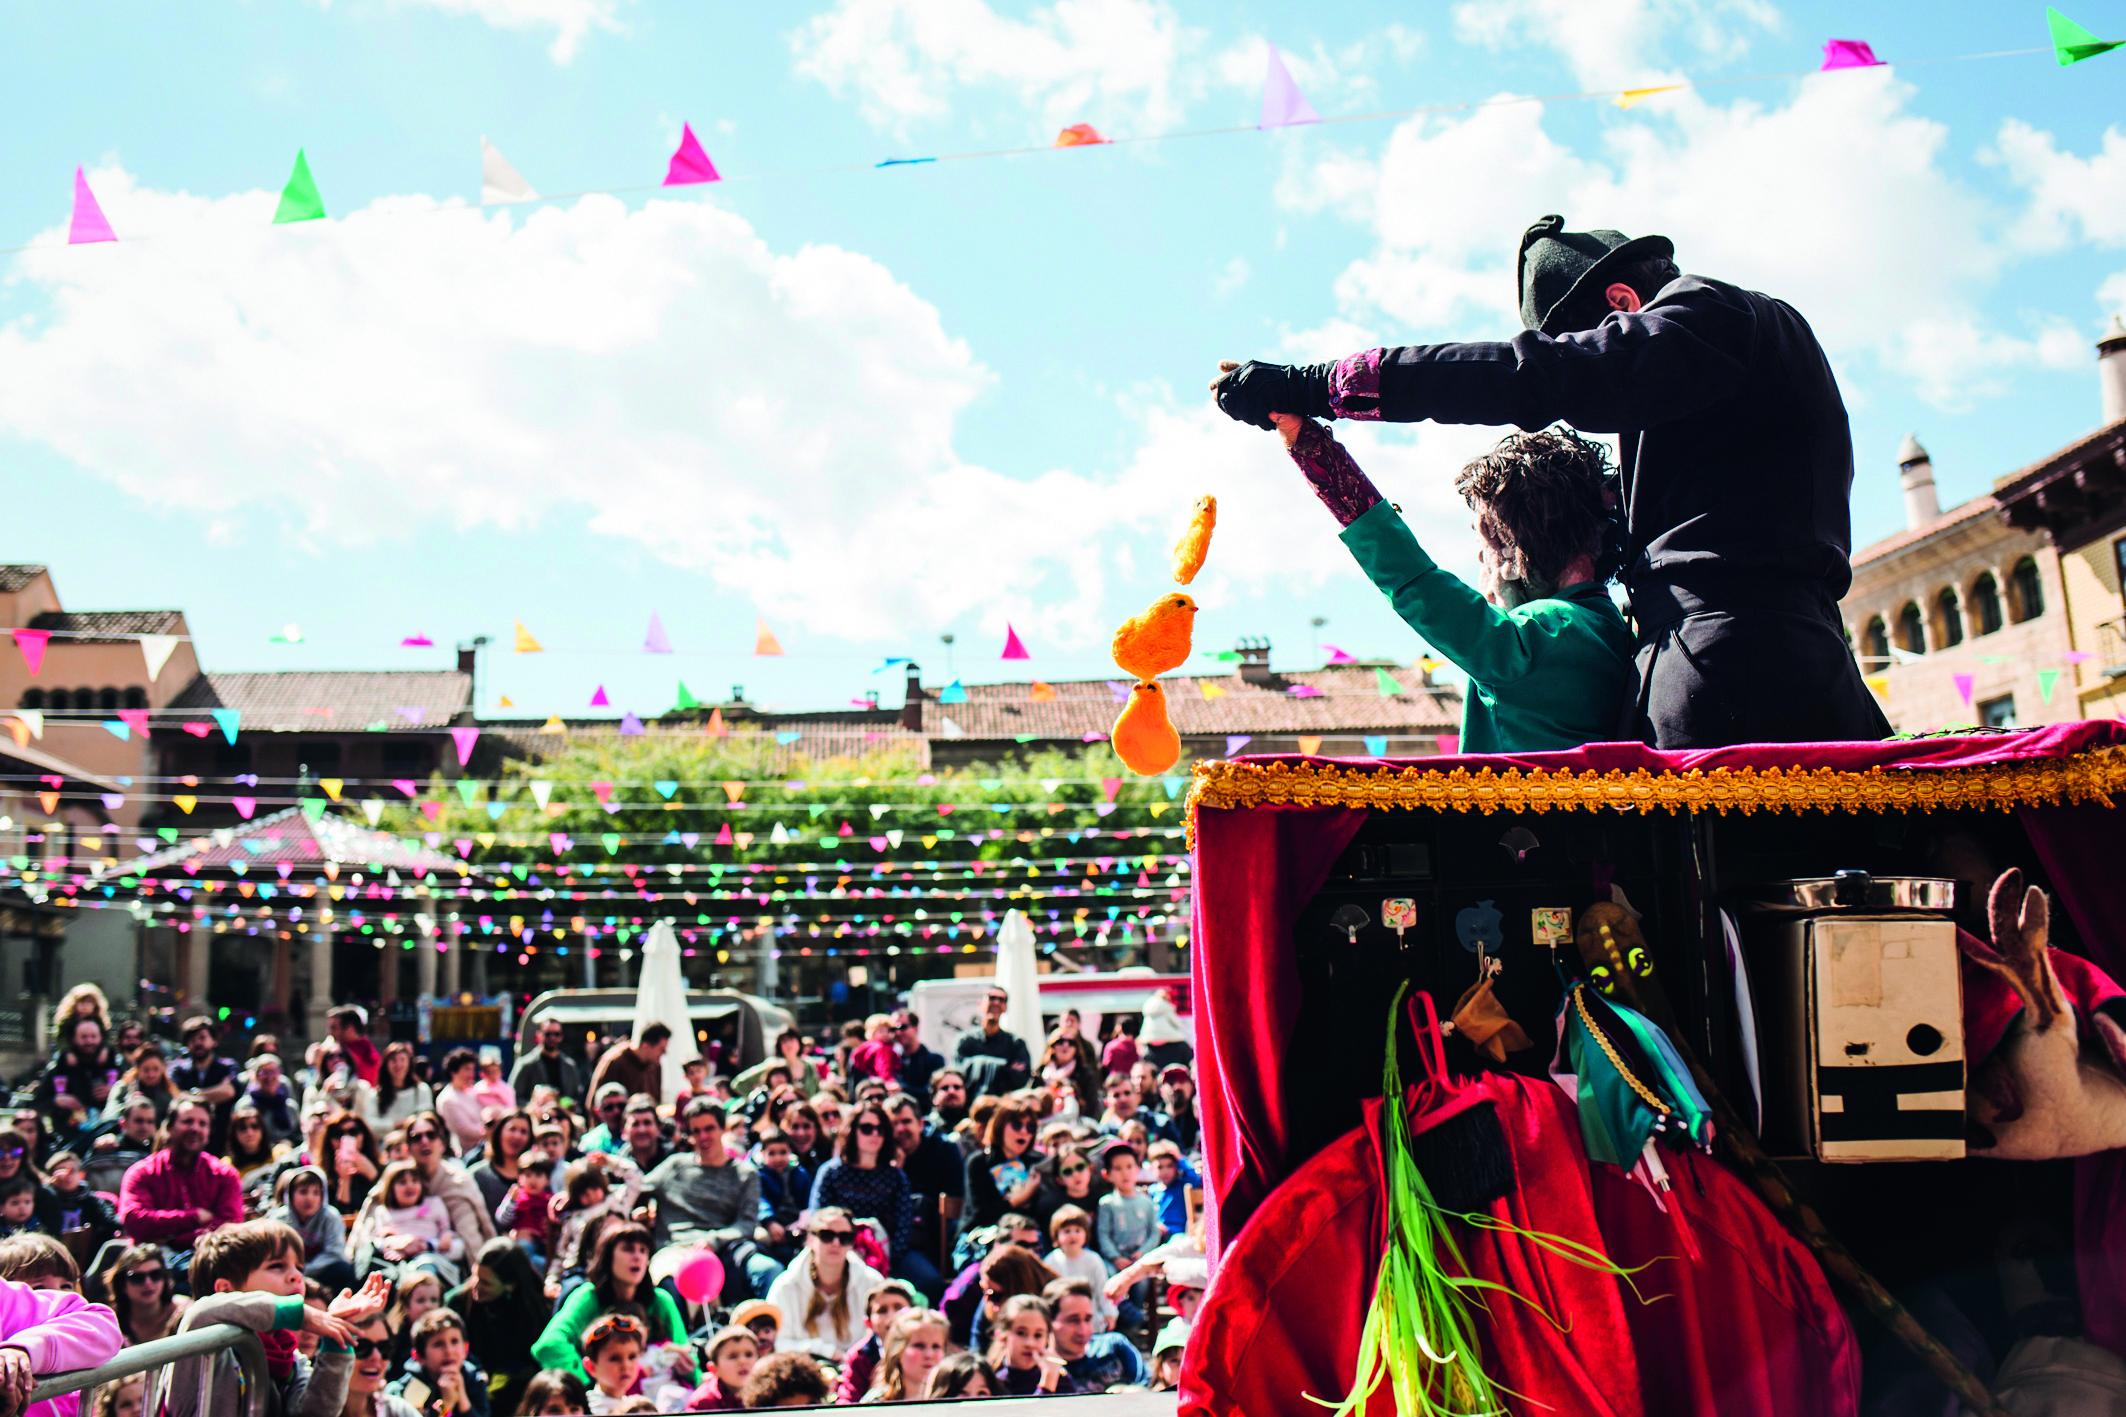 Festival de Titelles Poble Espanyol